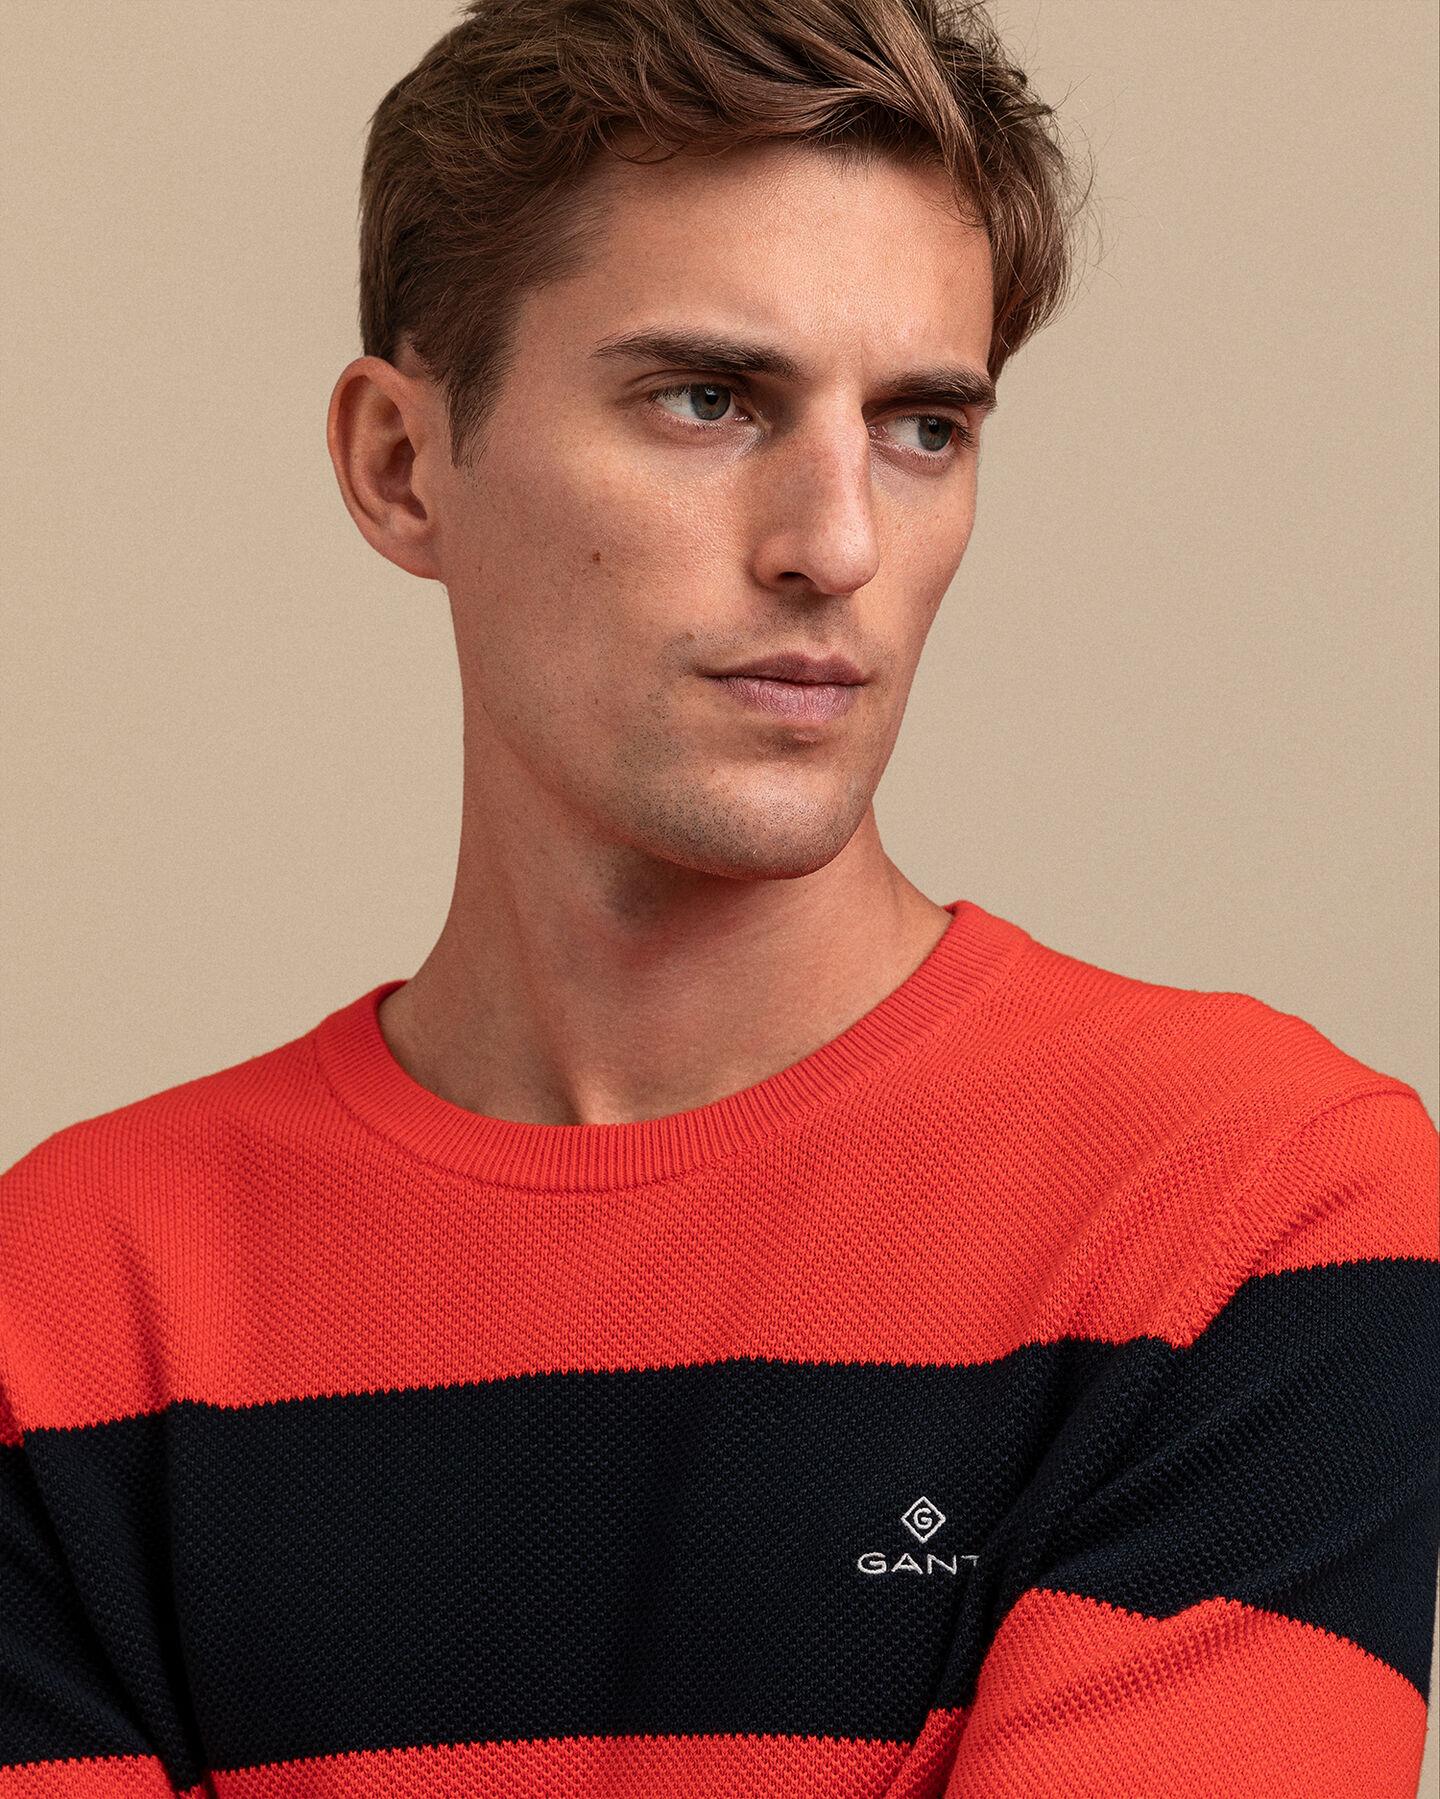 Bunt gestreifter Baumwoll Piqué Pullover